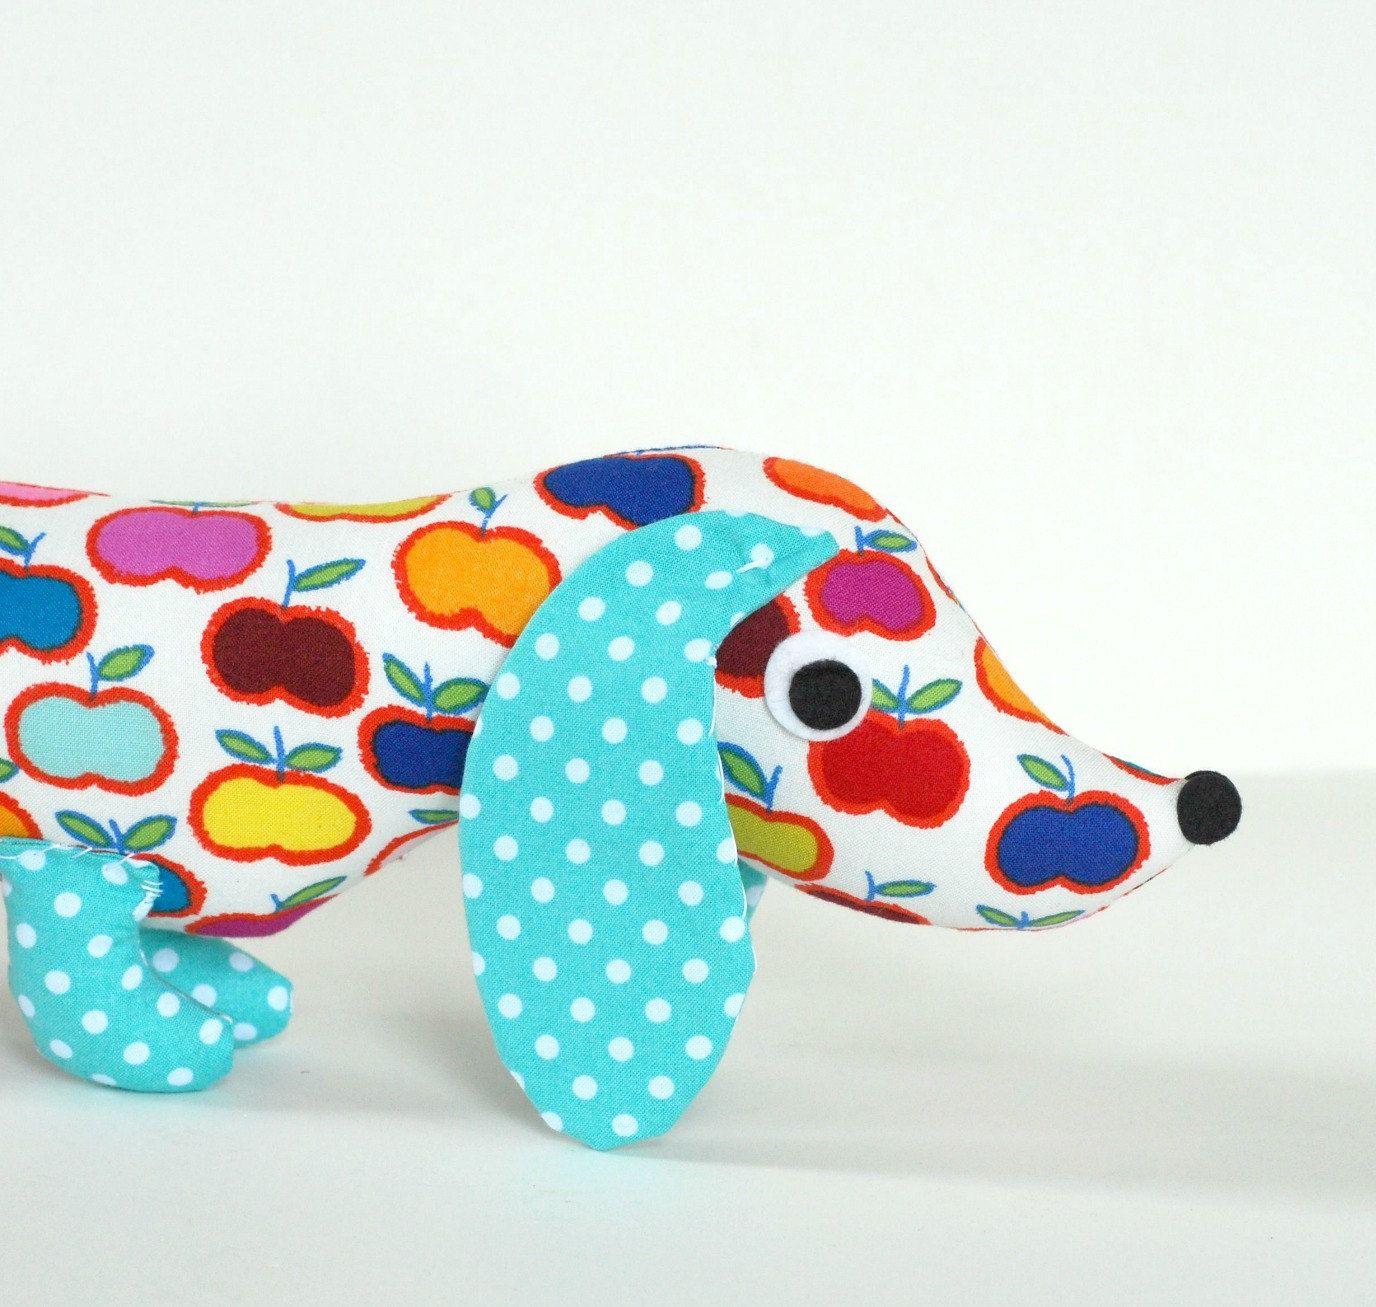 Childrens Toy Stuffed Animal Plush Wiener by FriendsOfSocktopus